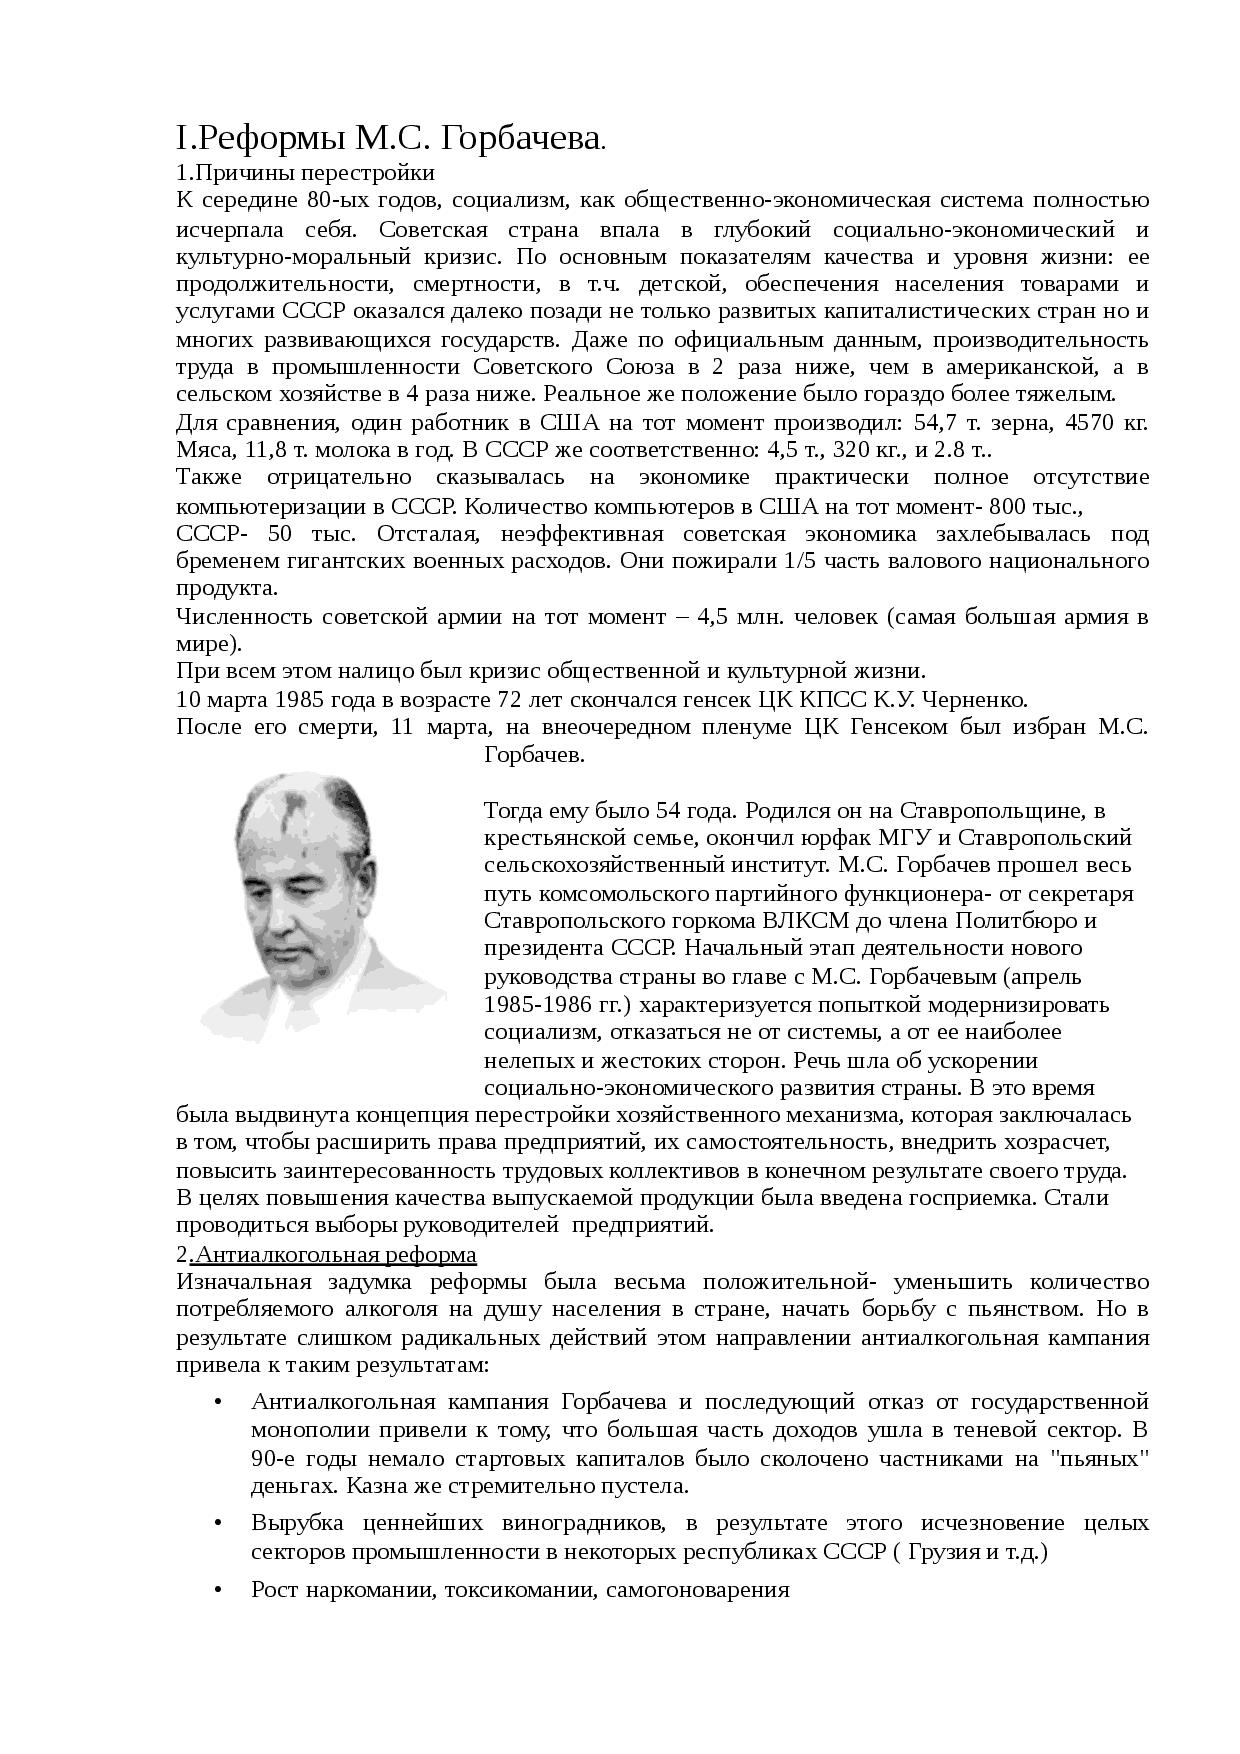 реформы горбачева кратко